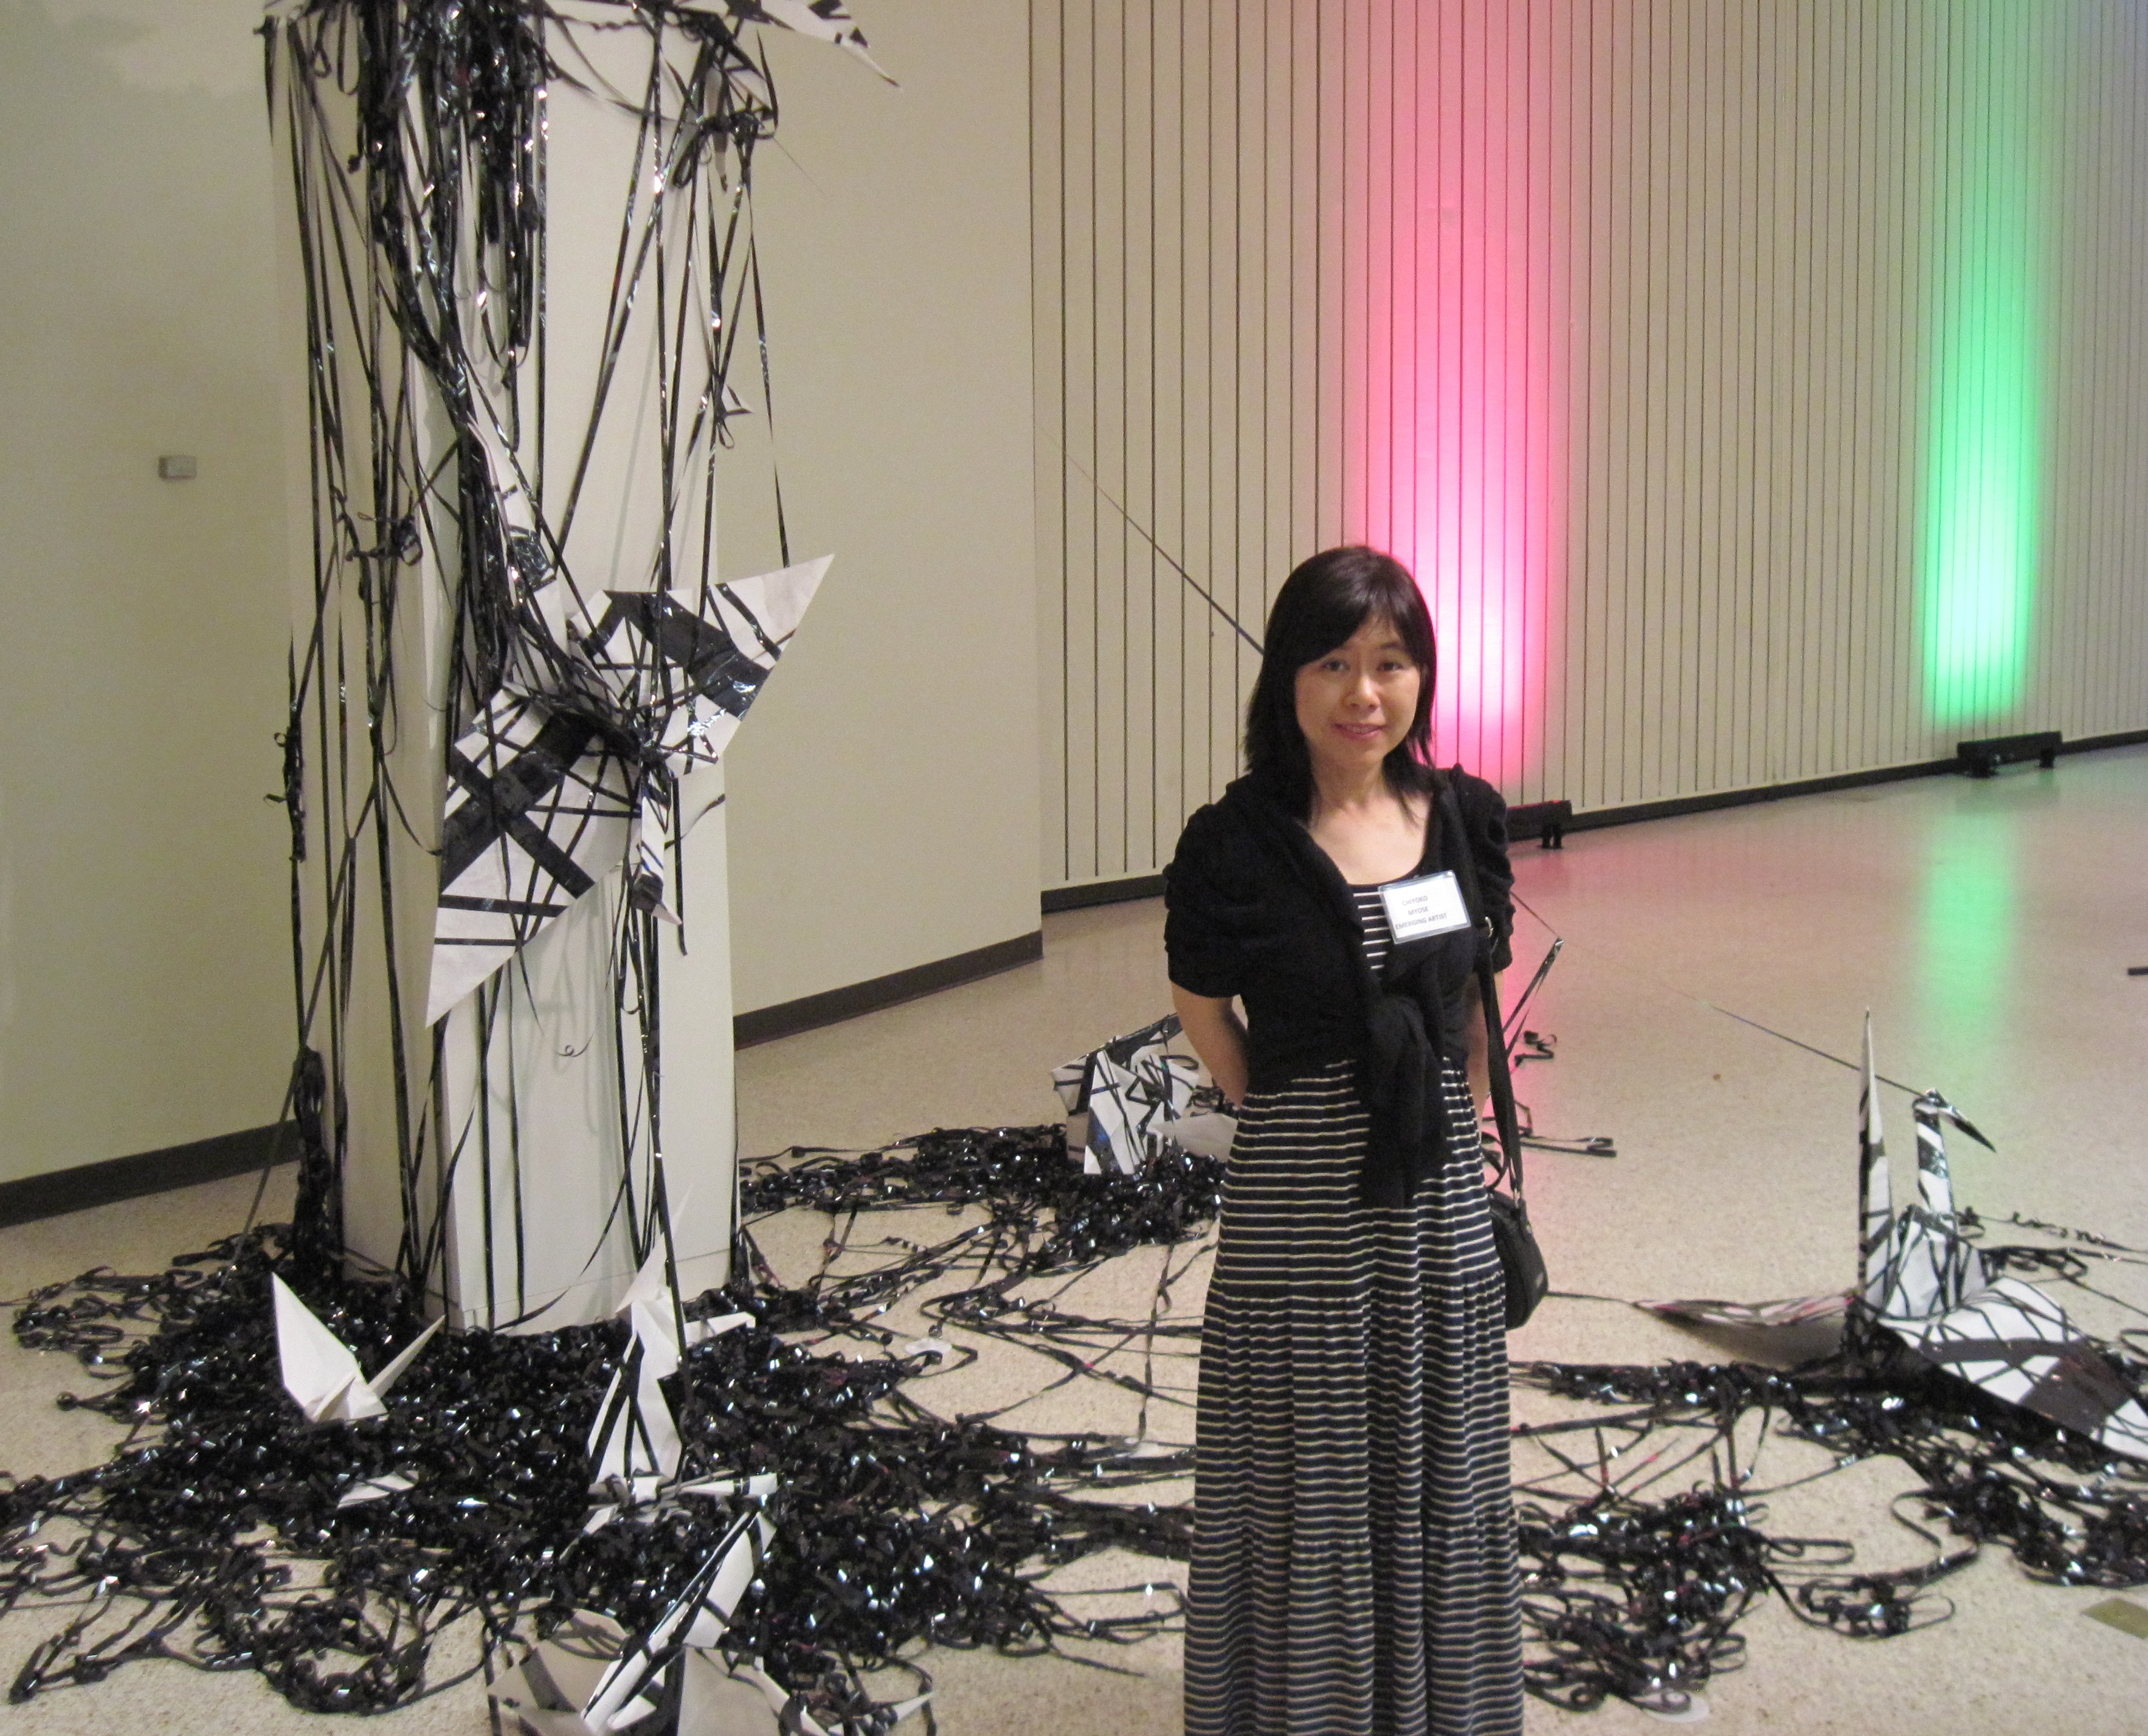 Artist Chiyoko Myos